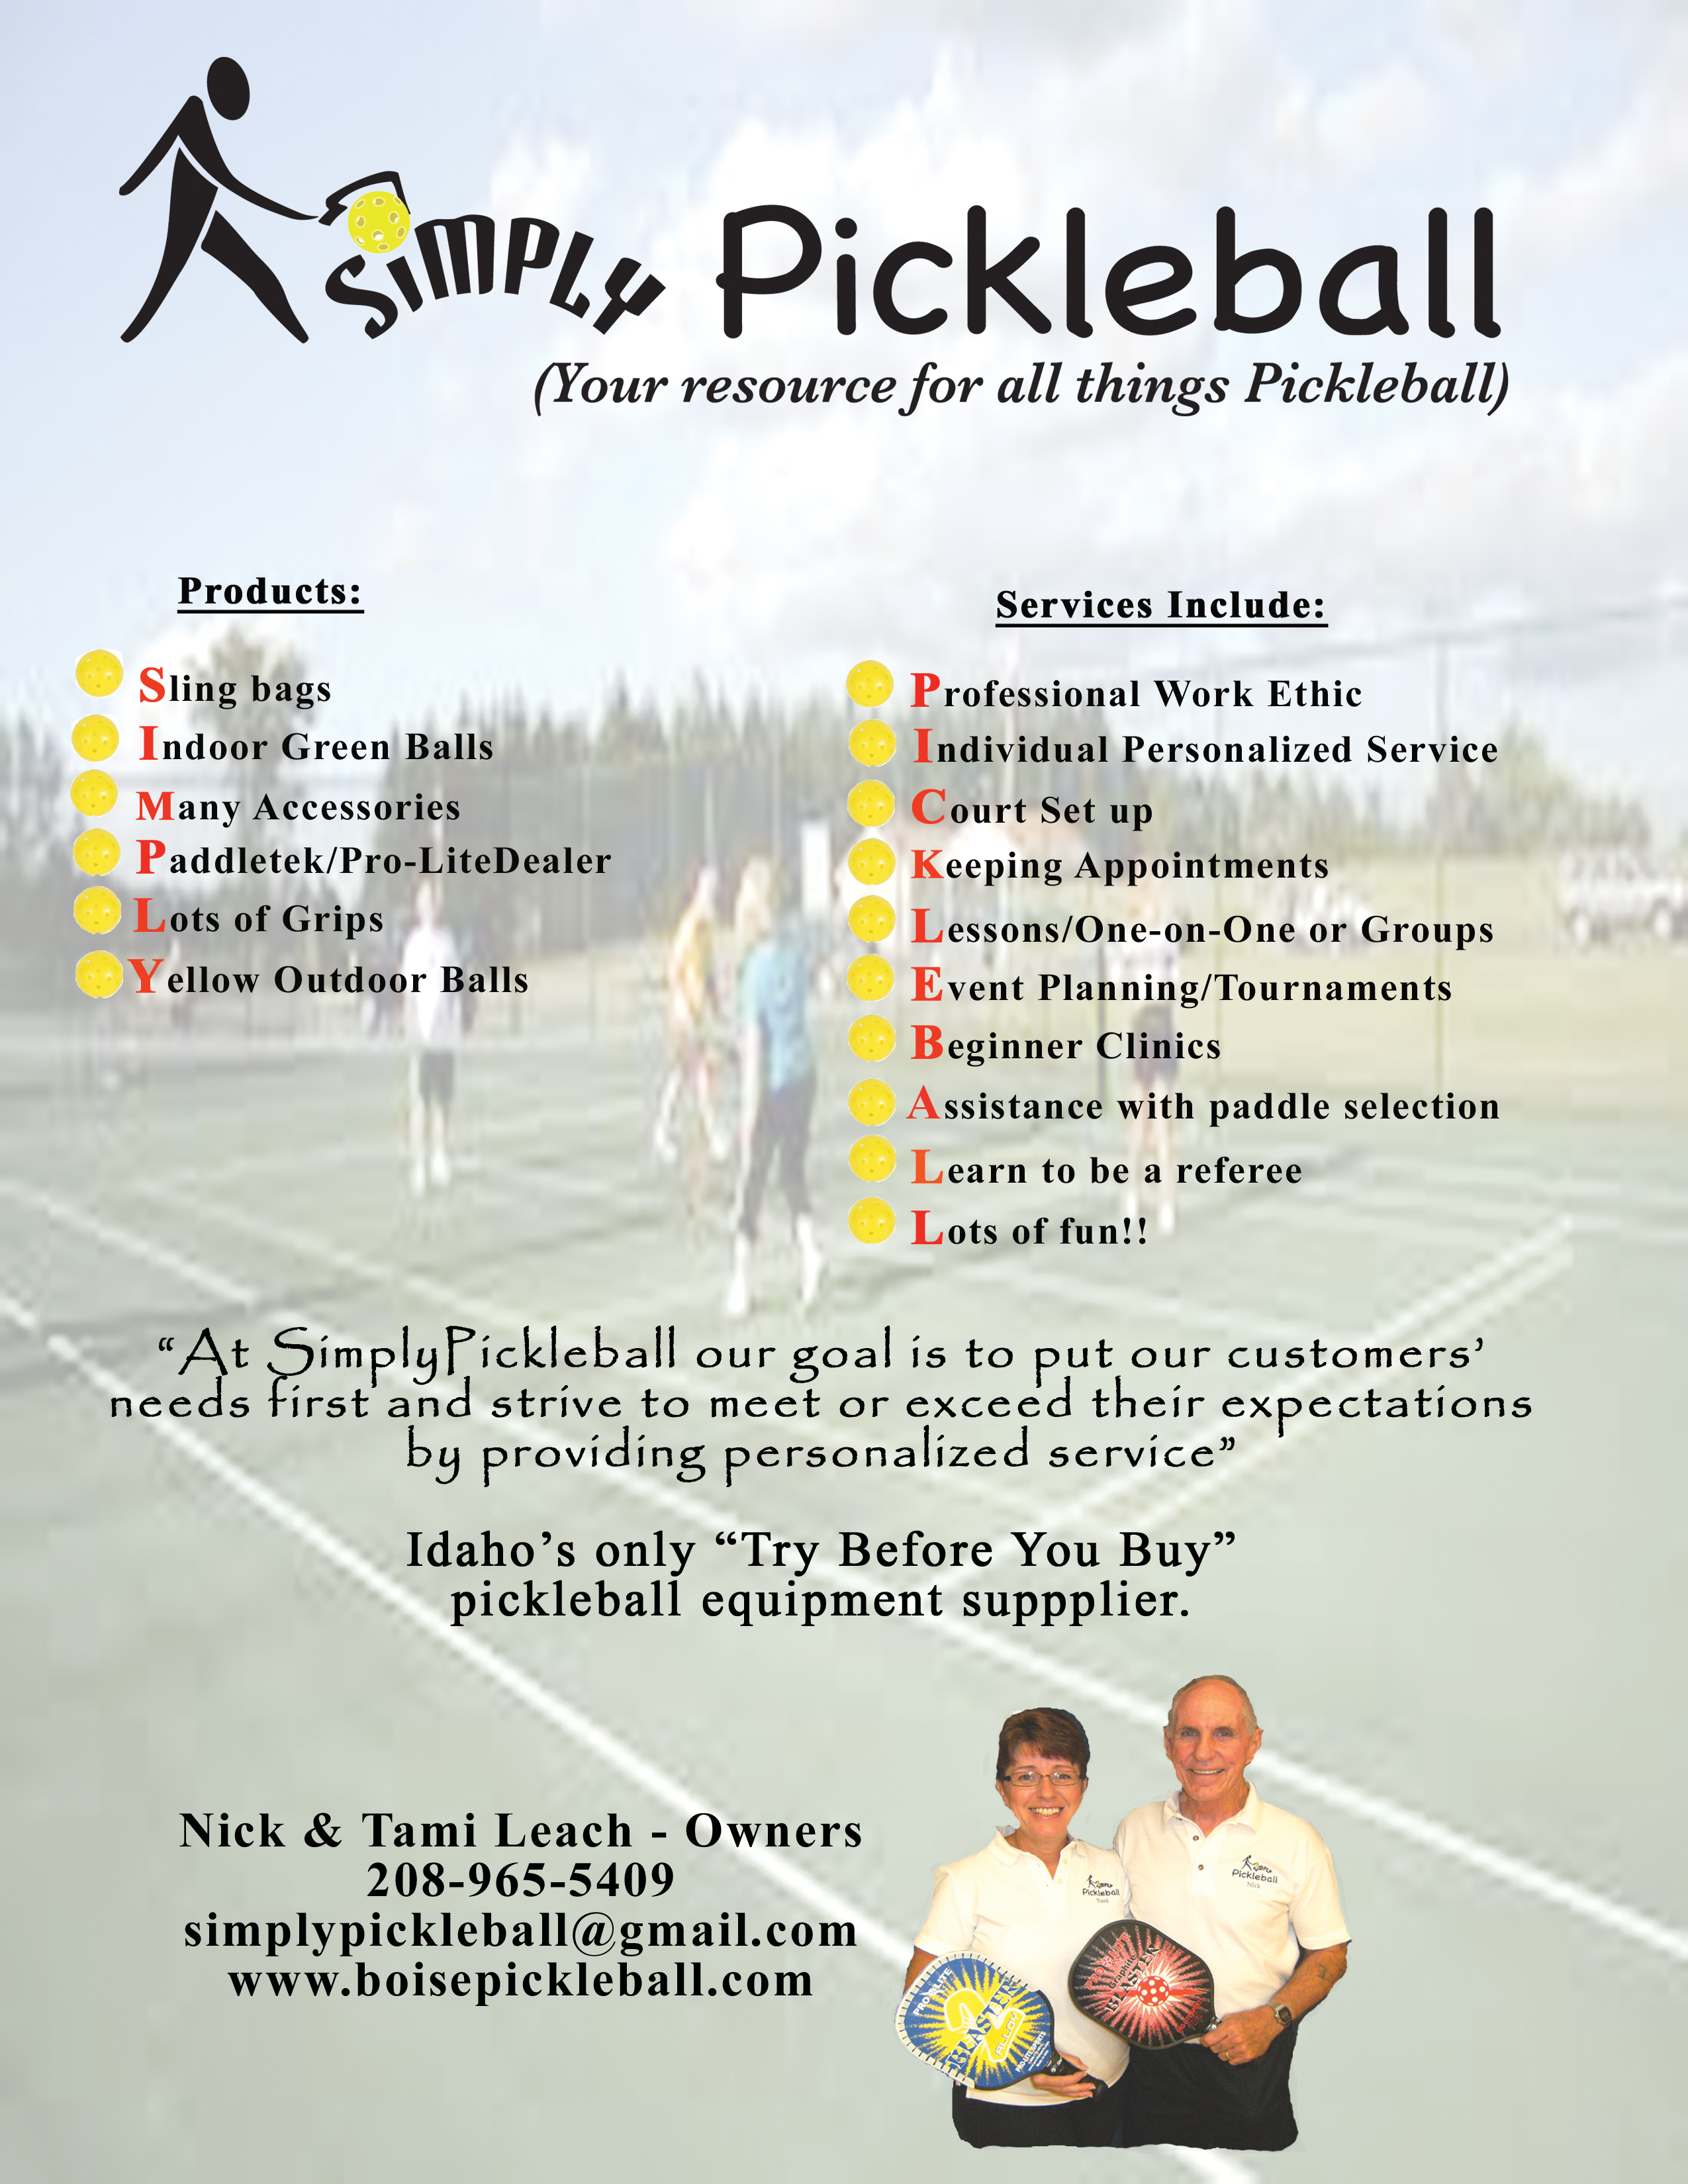 simply pickleball